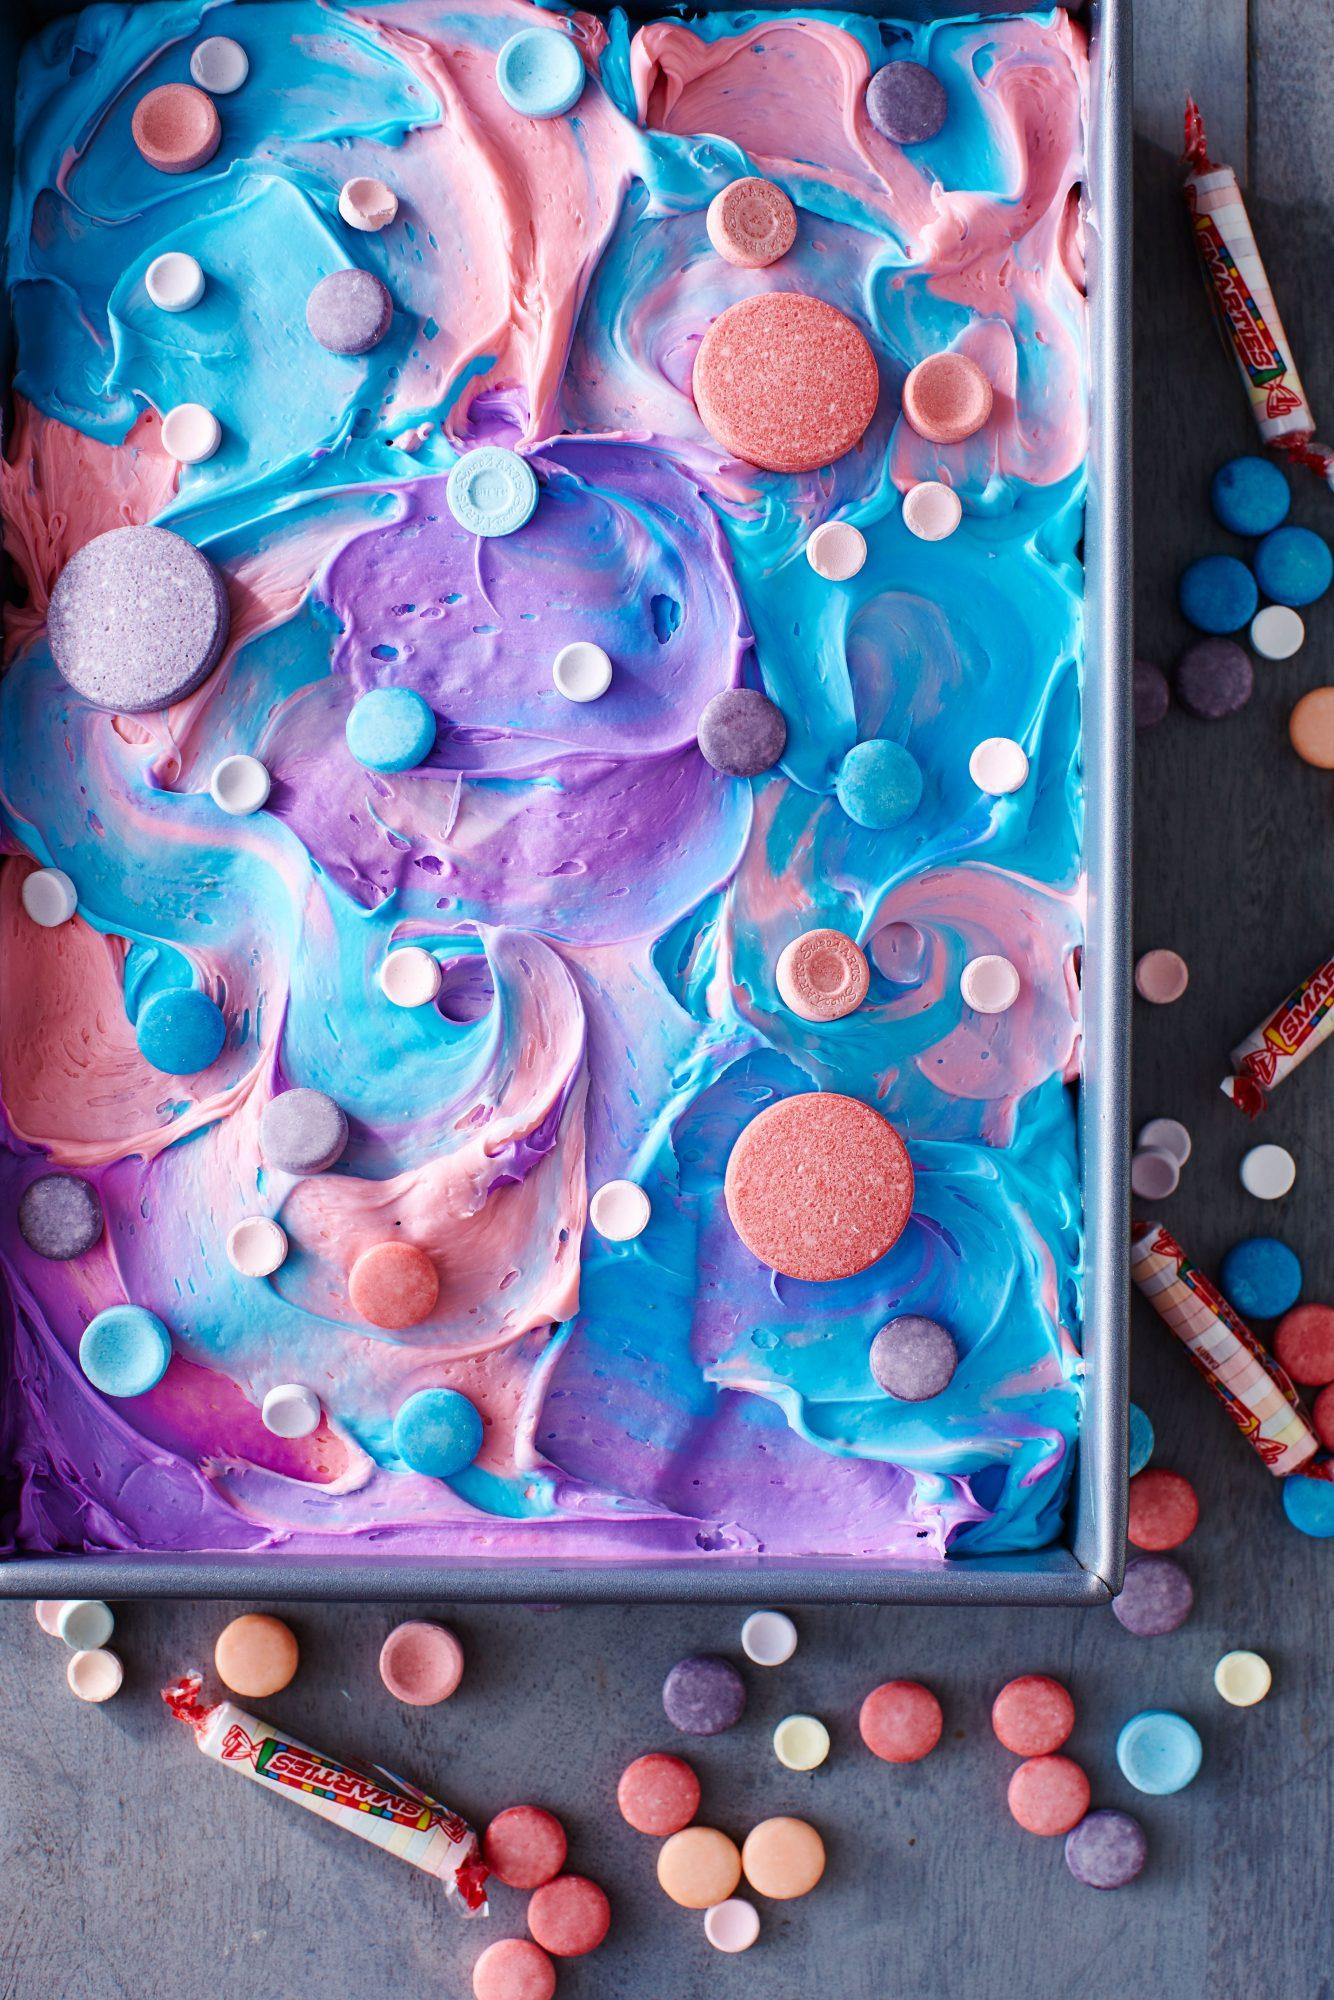 SweeTARTS and Smarties Tie-Dye Cake